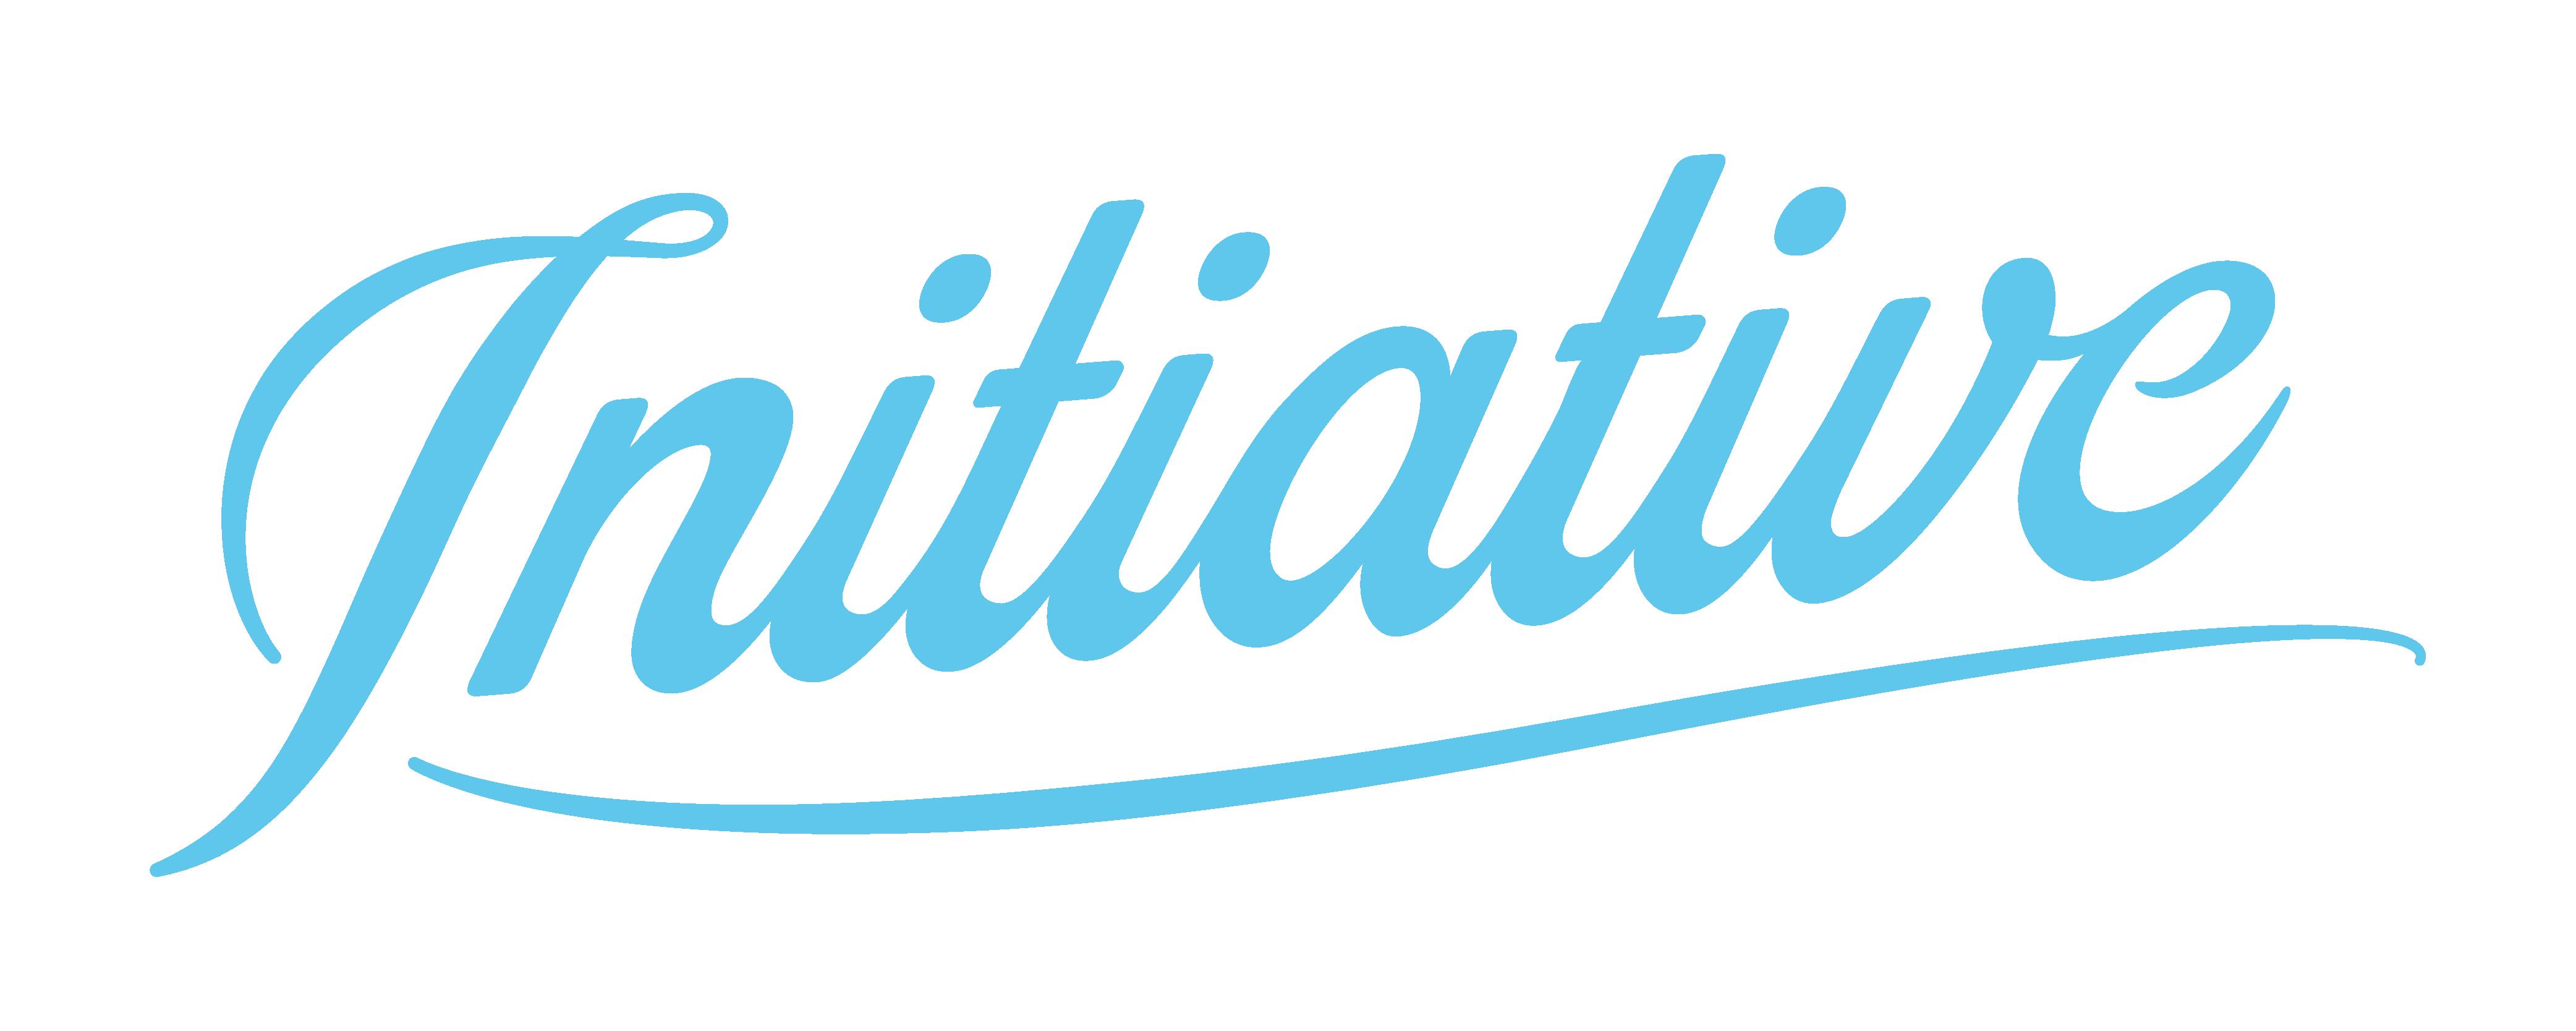 INITIATIVE MEDIA Werbemittlung GmbH